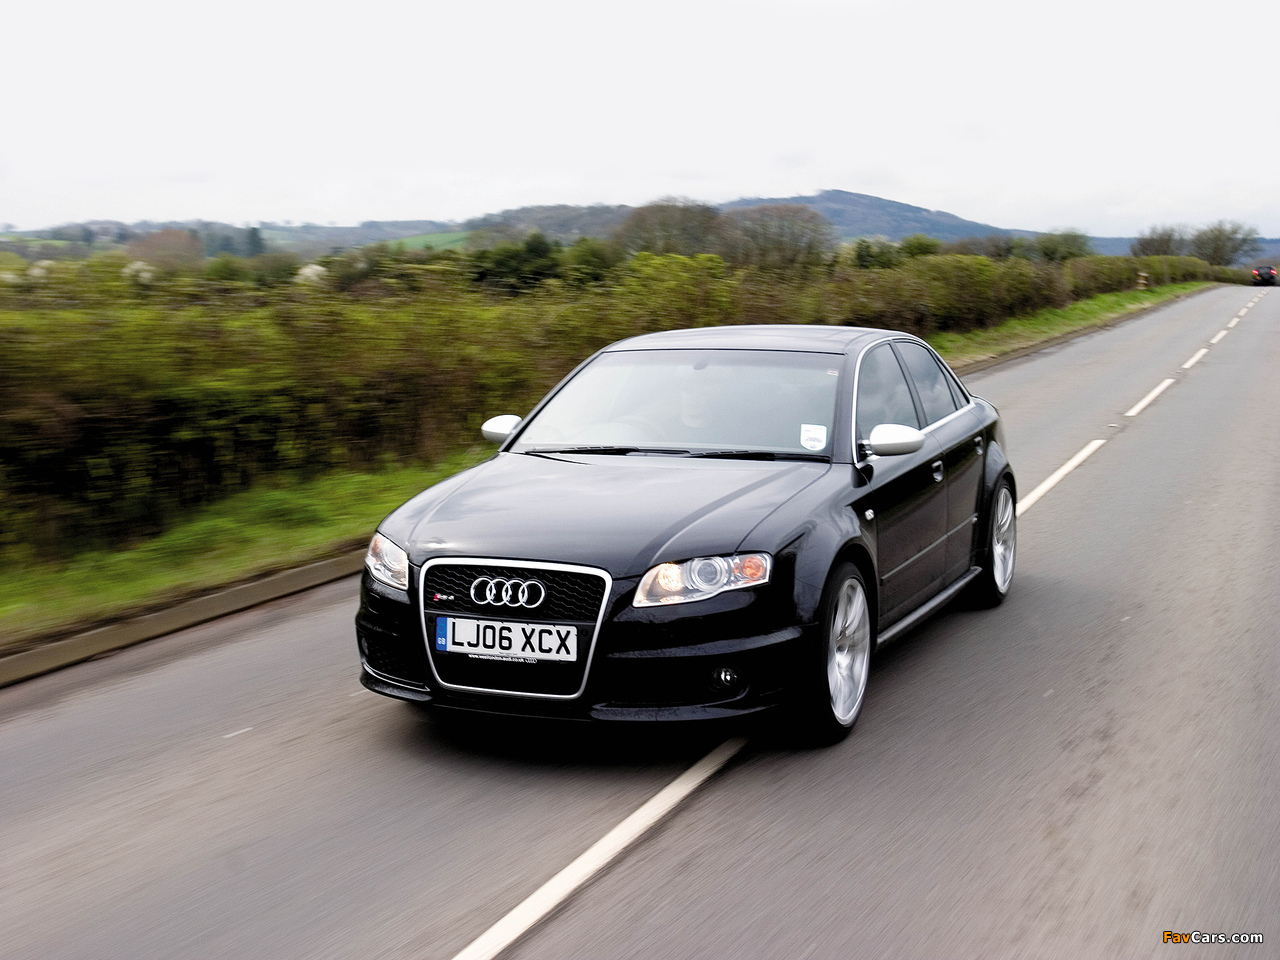 Pictures Of Audi Rs4 Sedan Uk Spec B7 8e 2005 07 1280x960